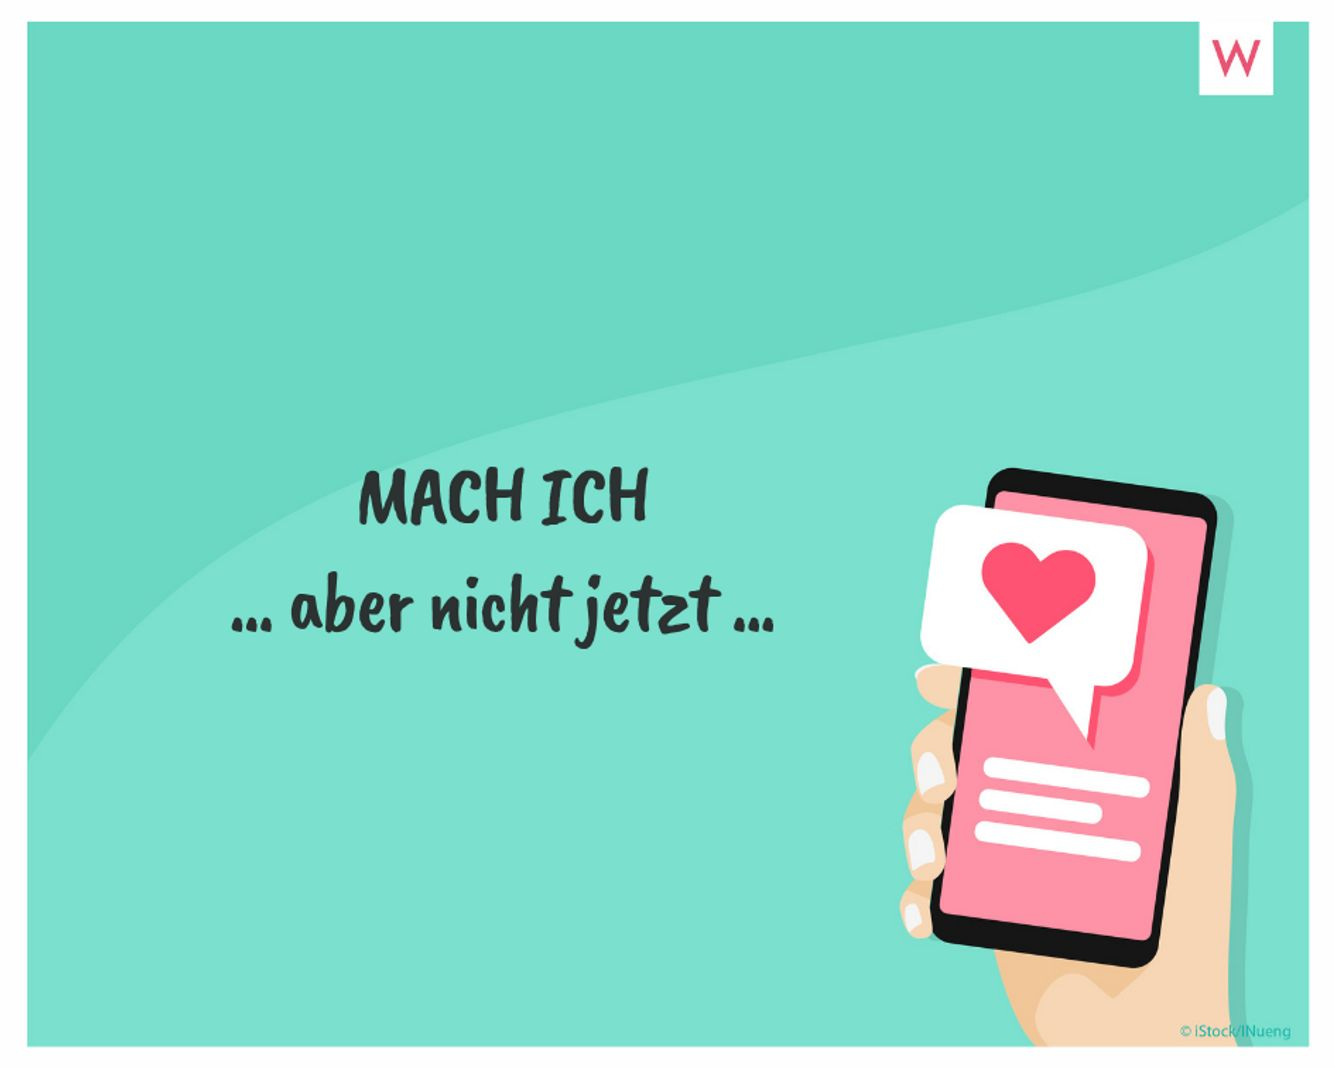 Dich ich whatsapp knuddel bilder ᐅ Knuddelgrüße